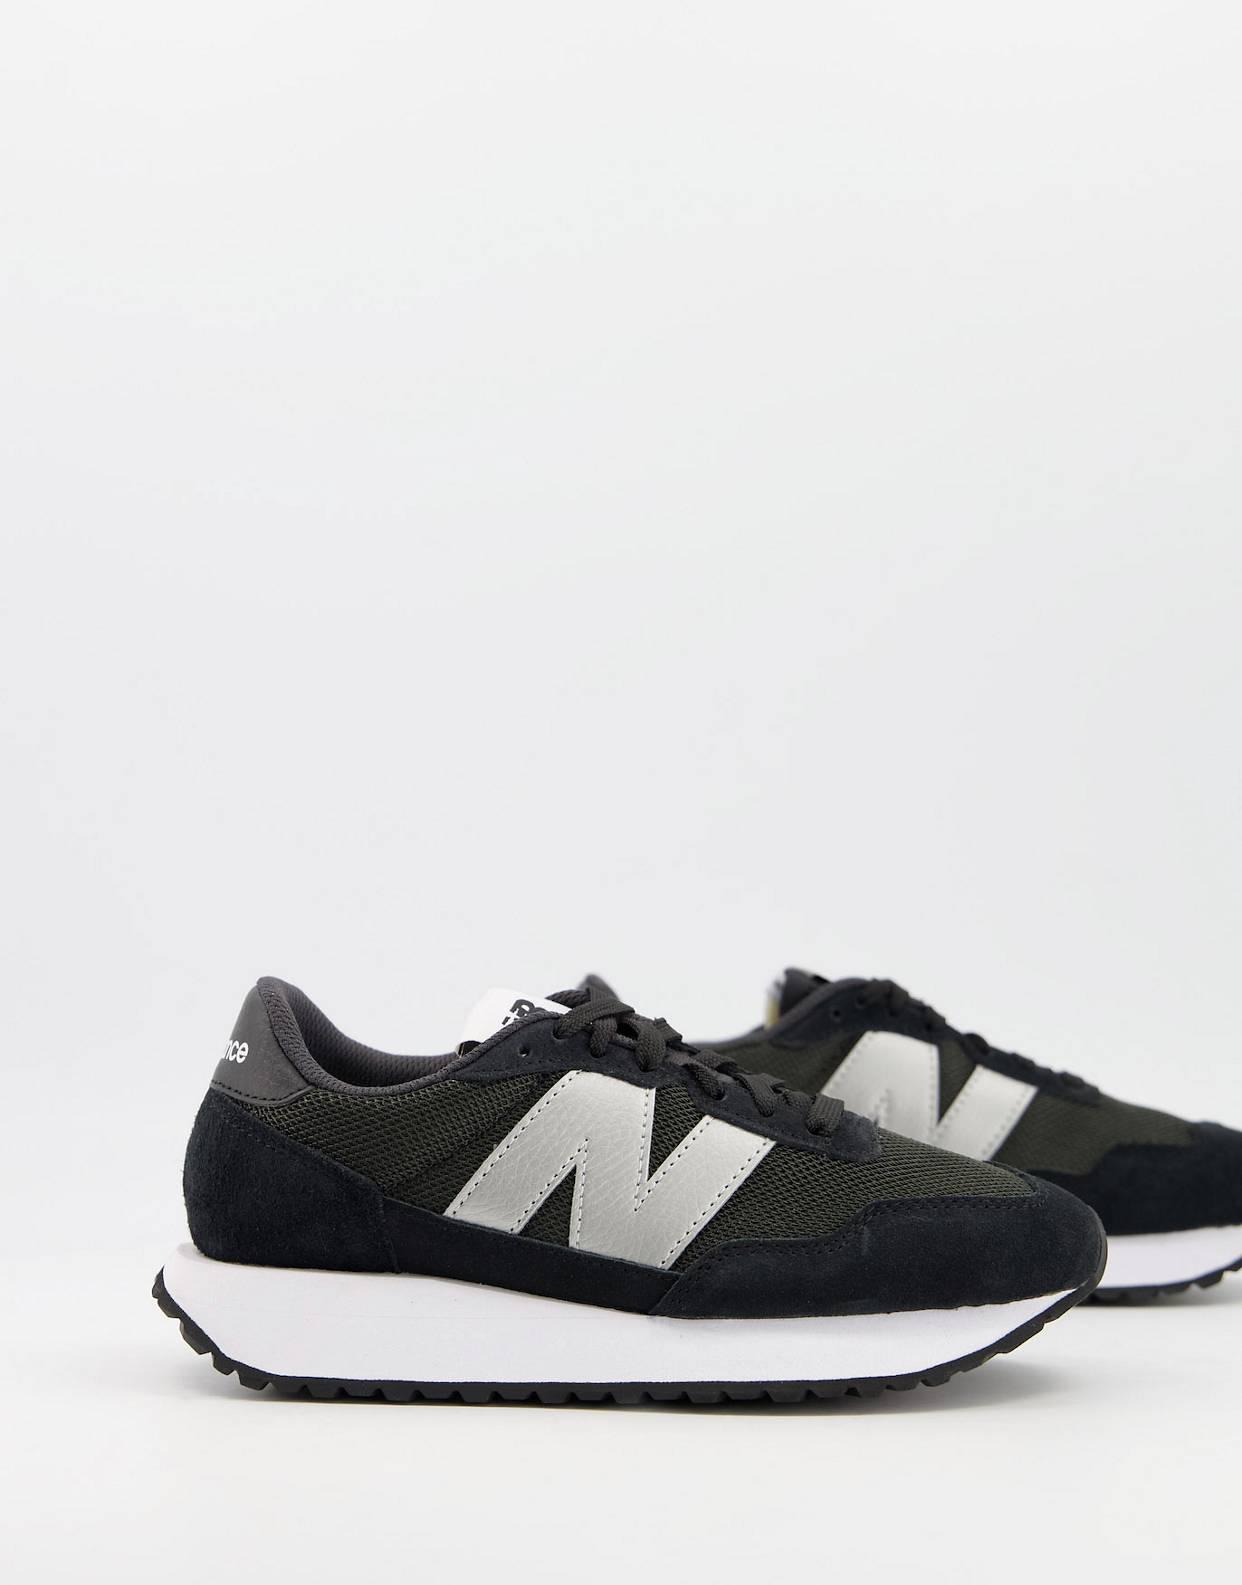 Zapatillas de deporte negras 237 de New Balance